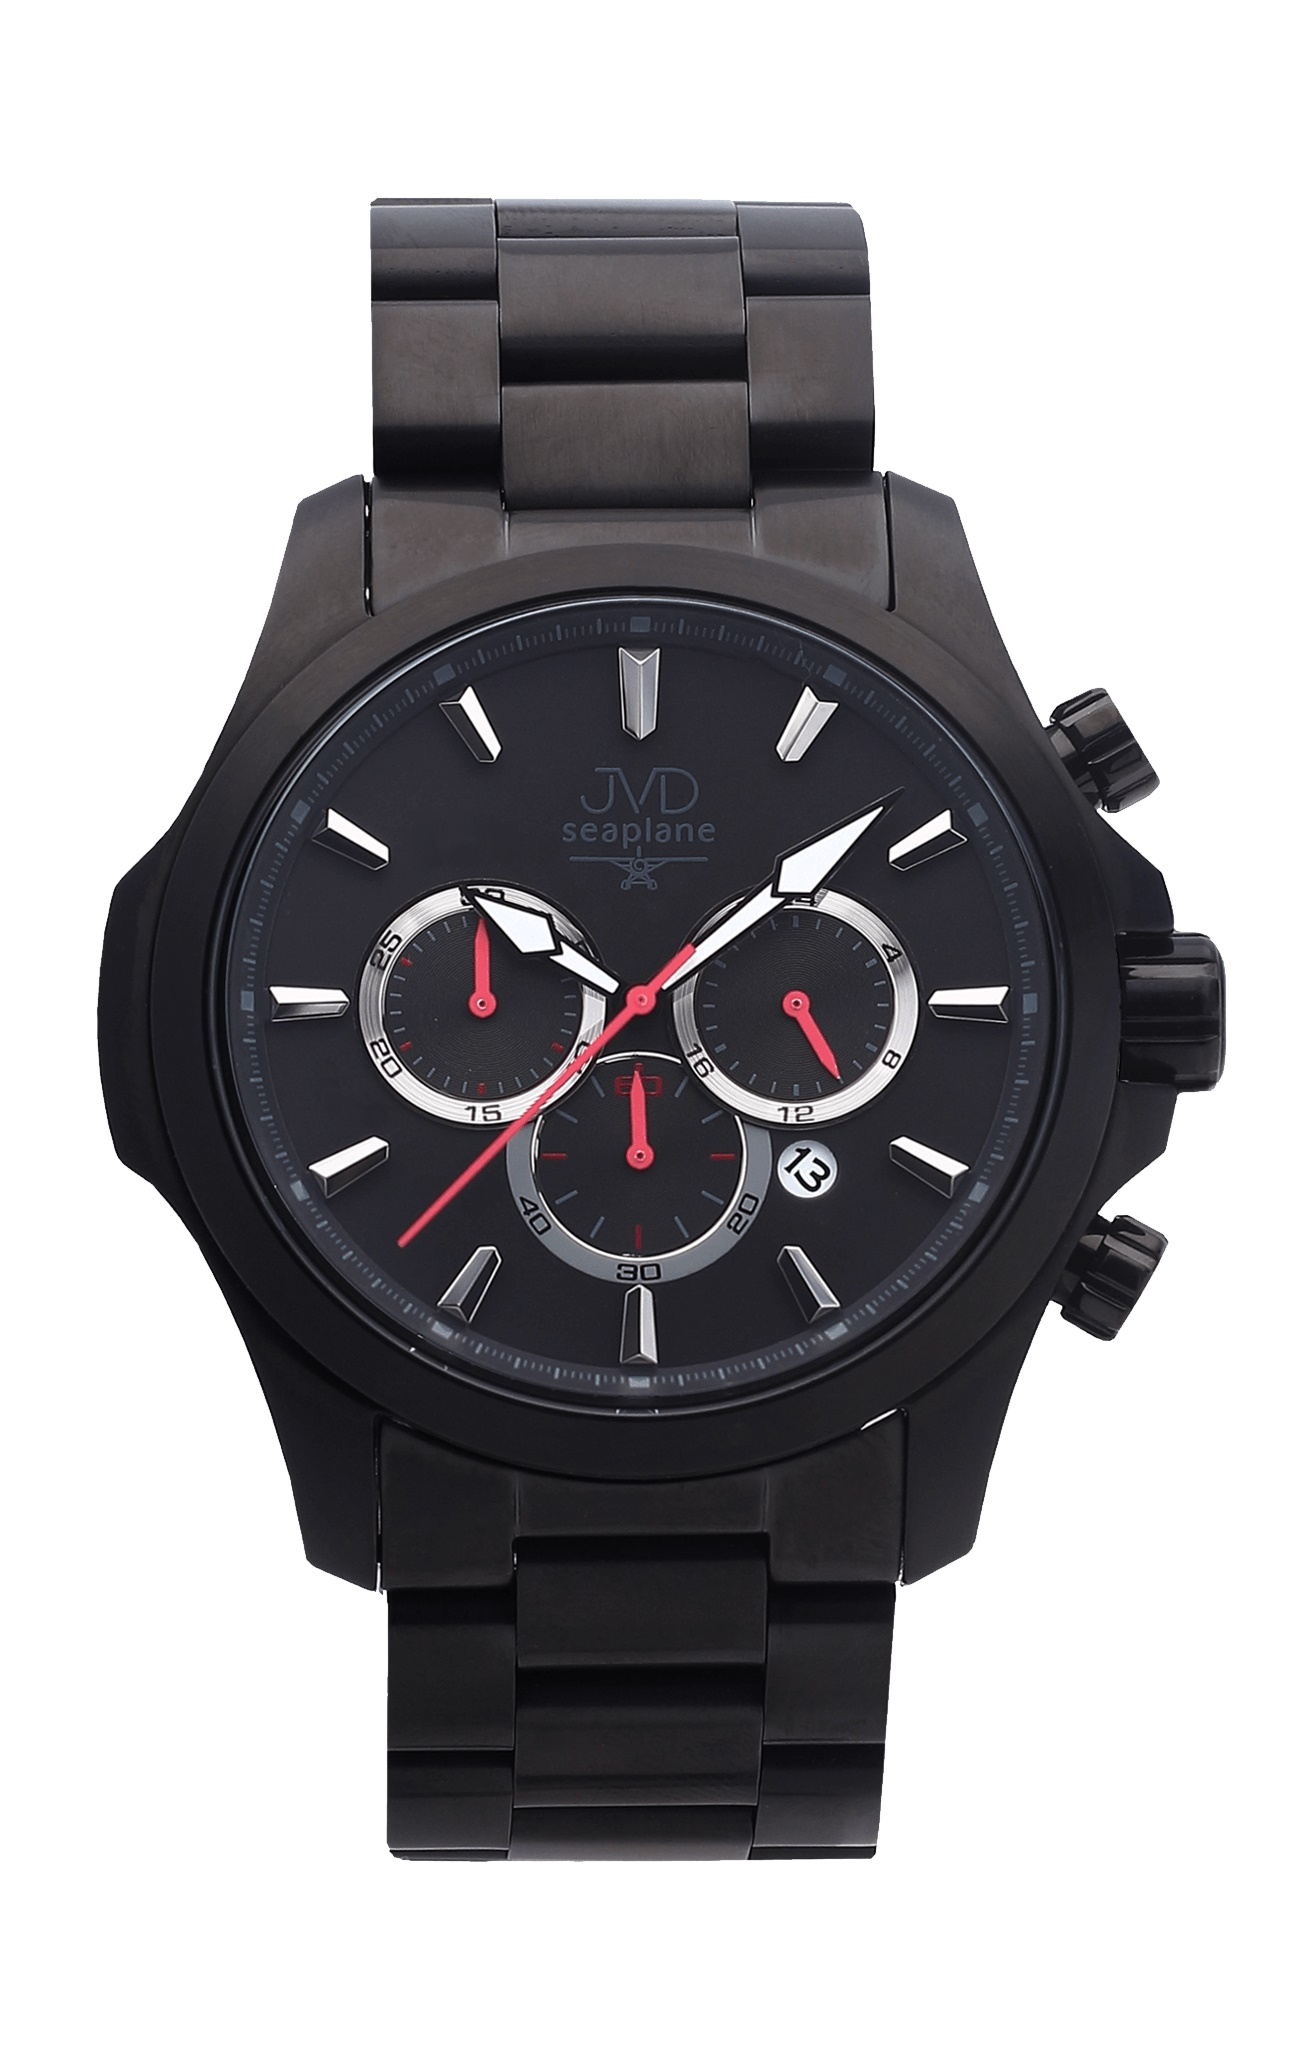 Vysoce odolné vodotěsné chronografy hodinky JVD Seaplane CORE JC704.3 - 10ATM (POŠTOVNÉ ZDARMA!!)